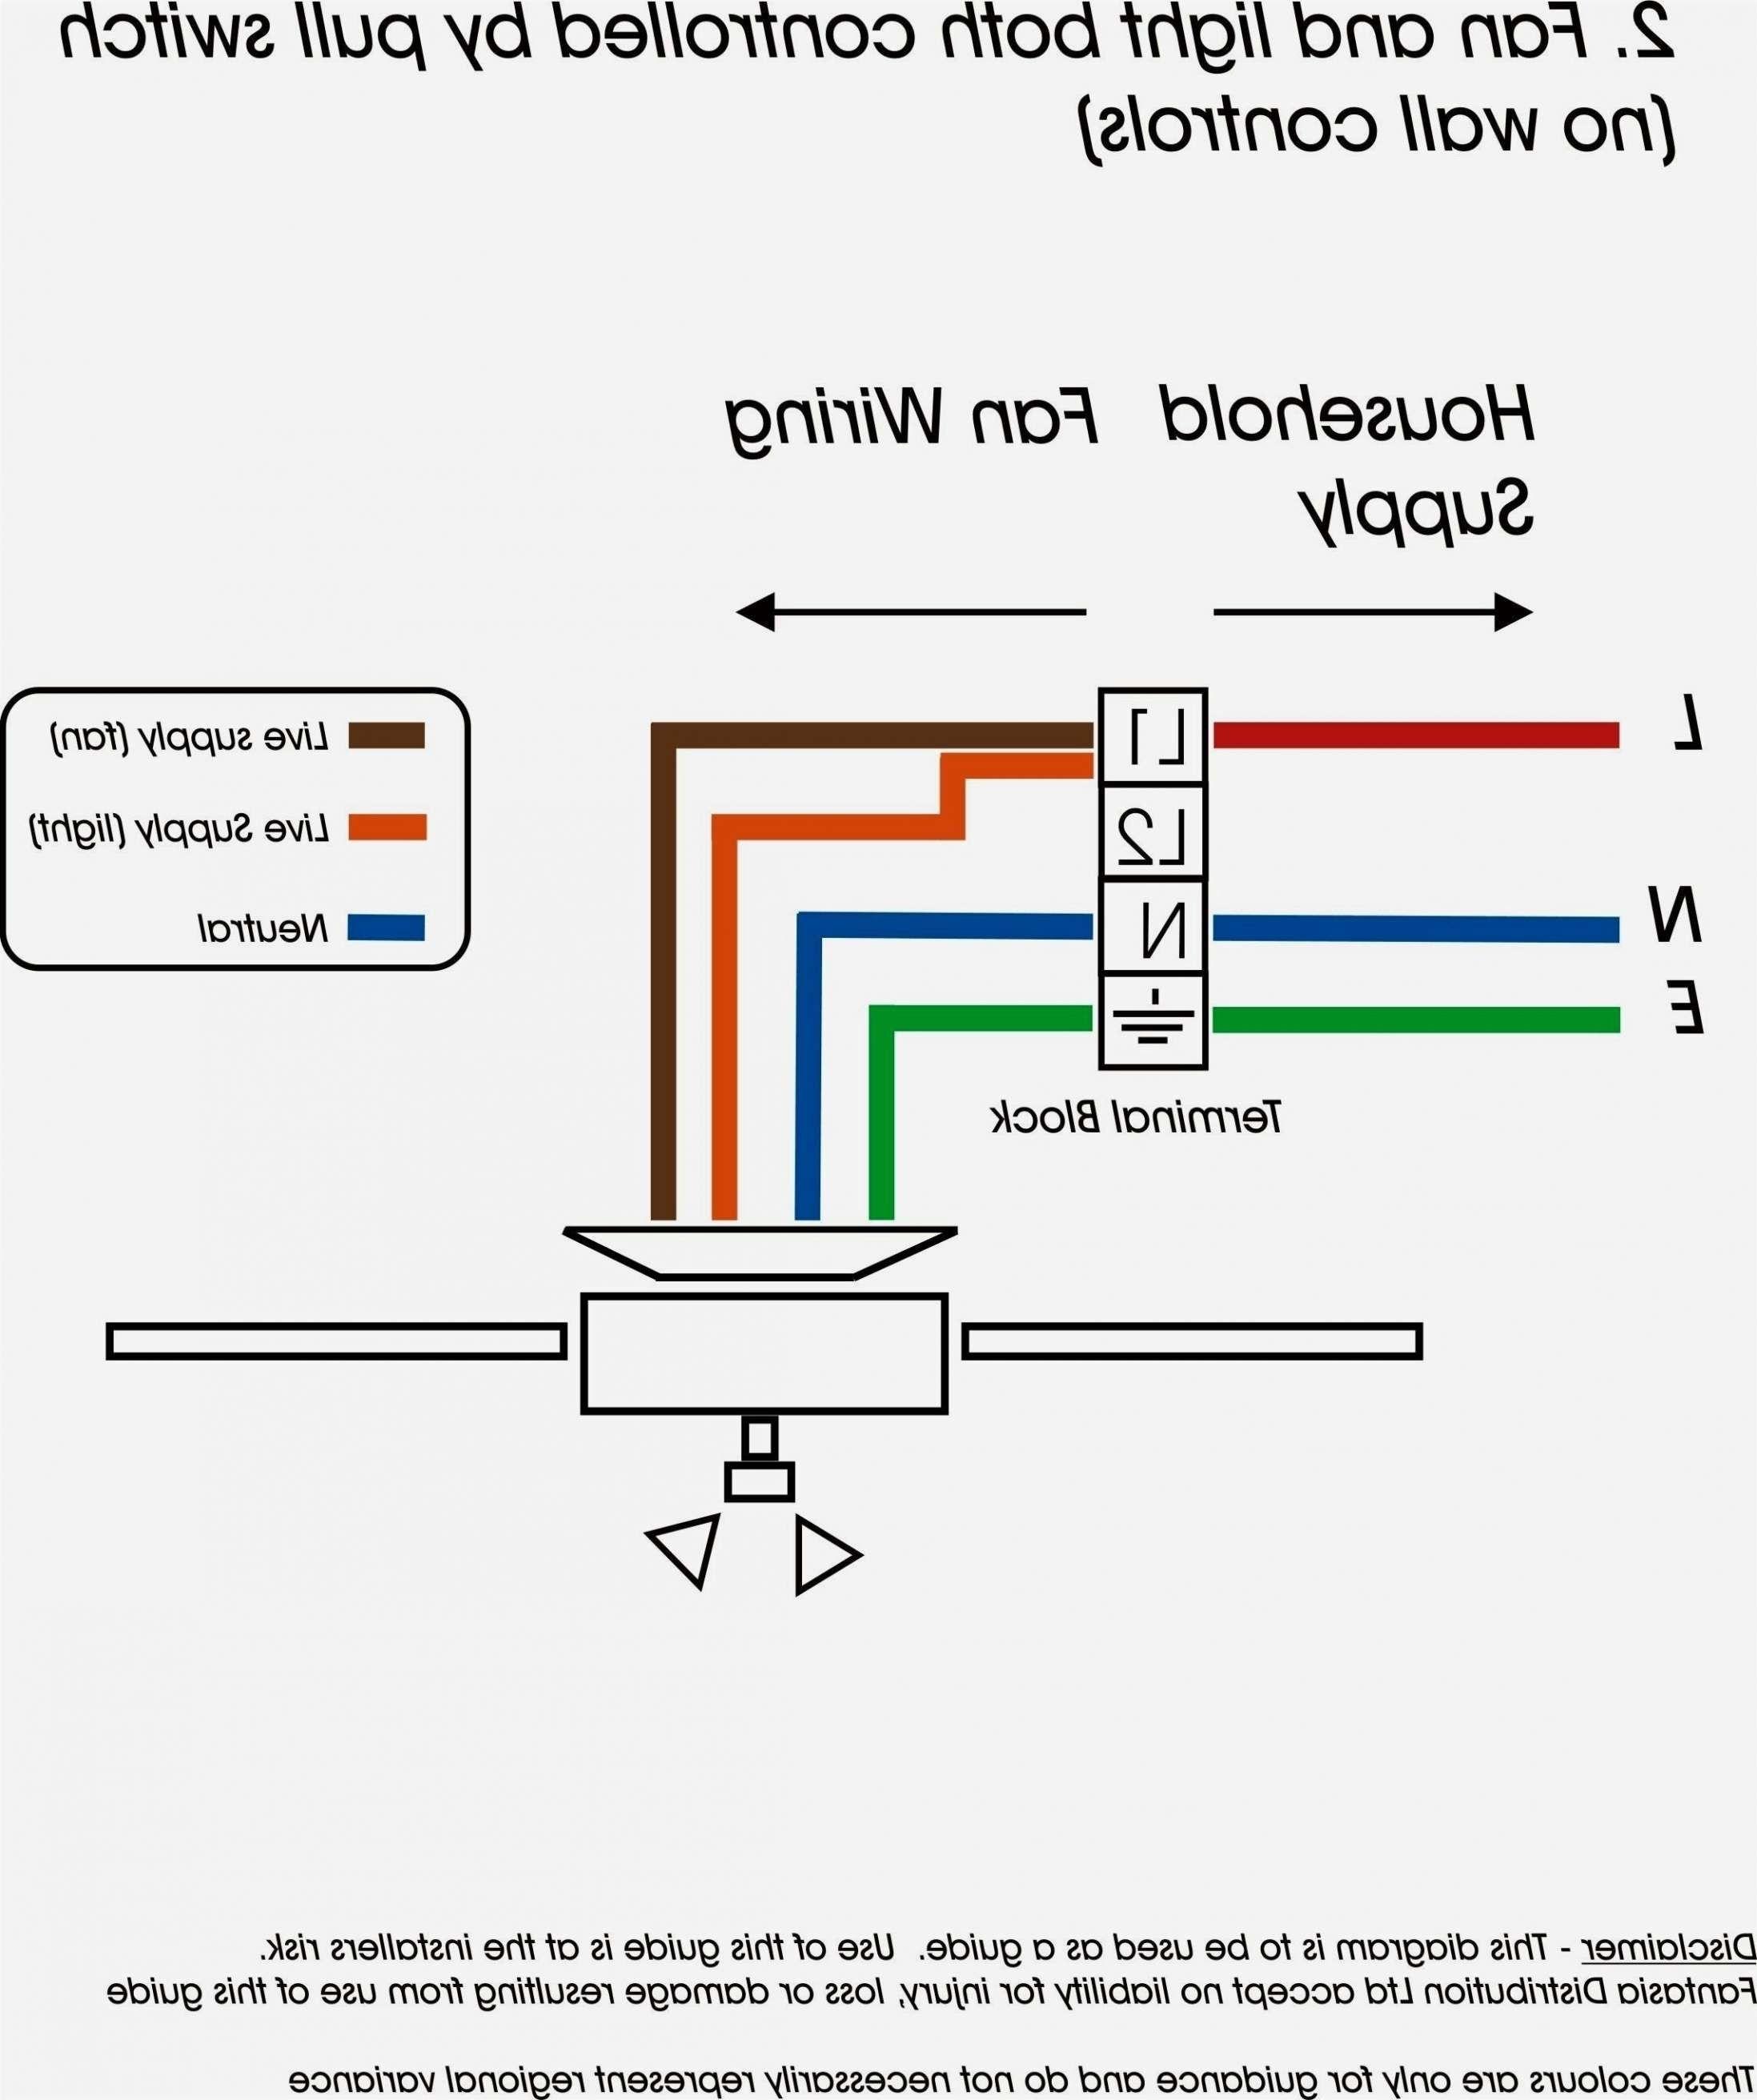 Beautiful Wiring Diagram For Bathroom Lights Diagrams Digramssample Diagramimages Ceiling Fan Wiring Ceiling Fan Switch Light Switch Wiring